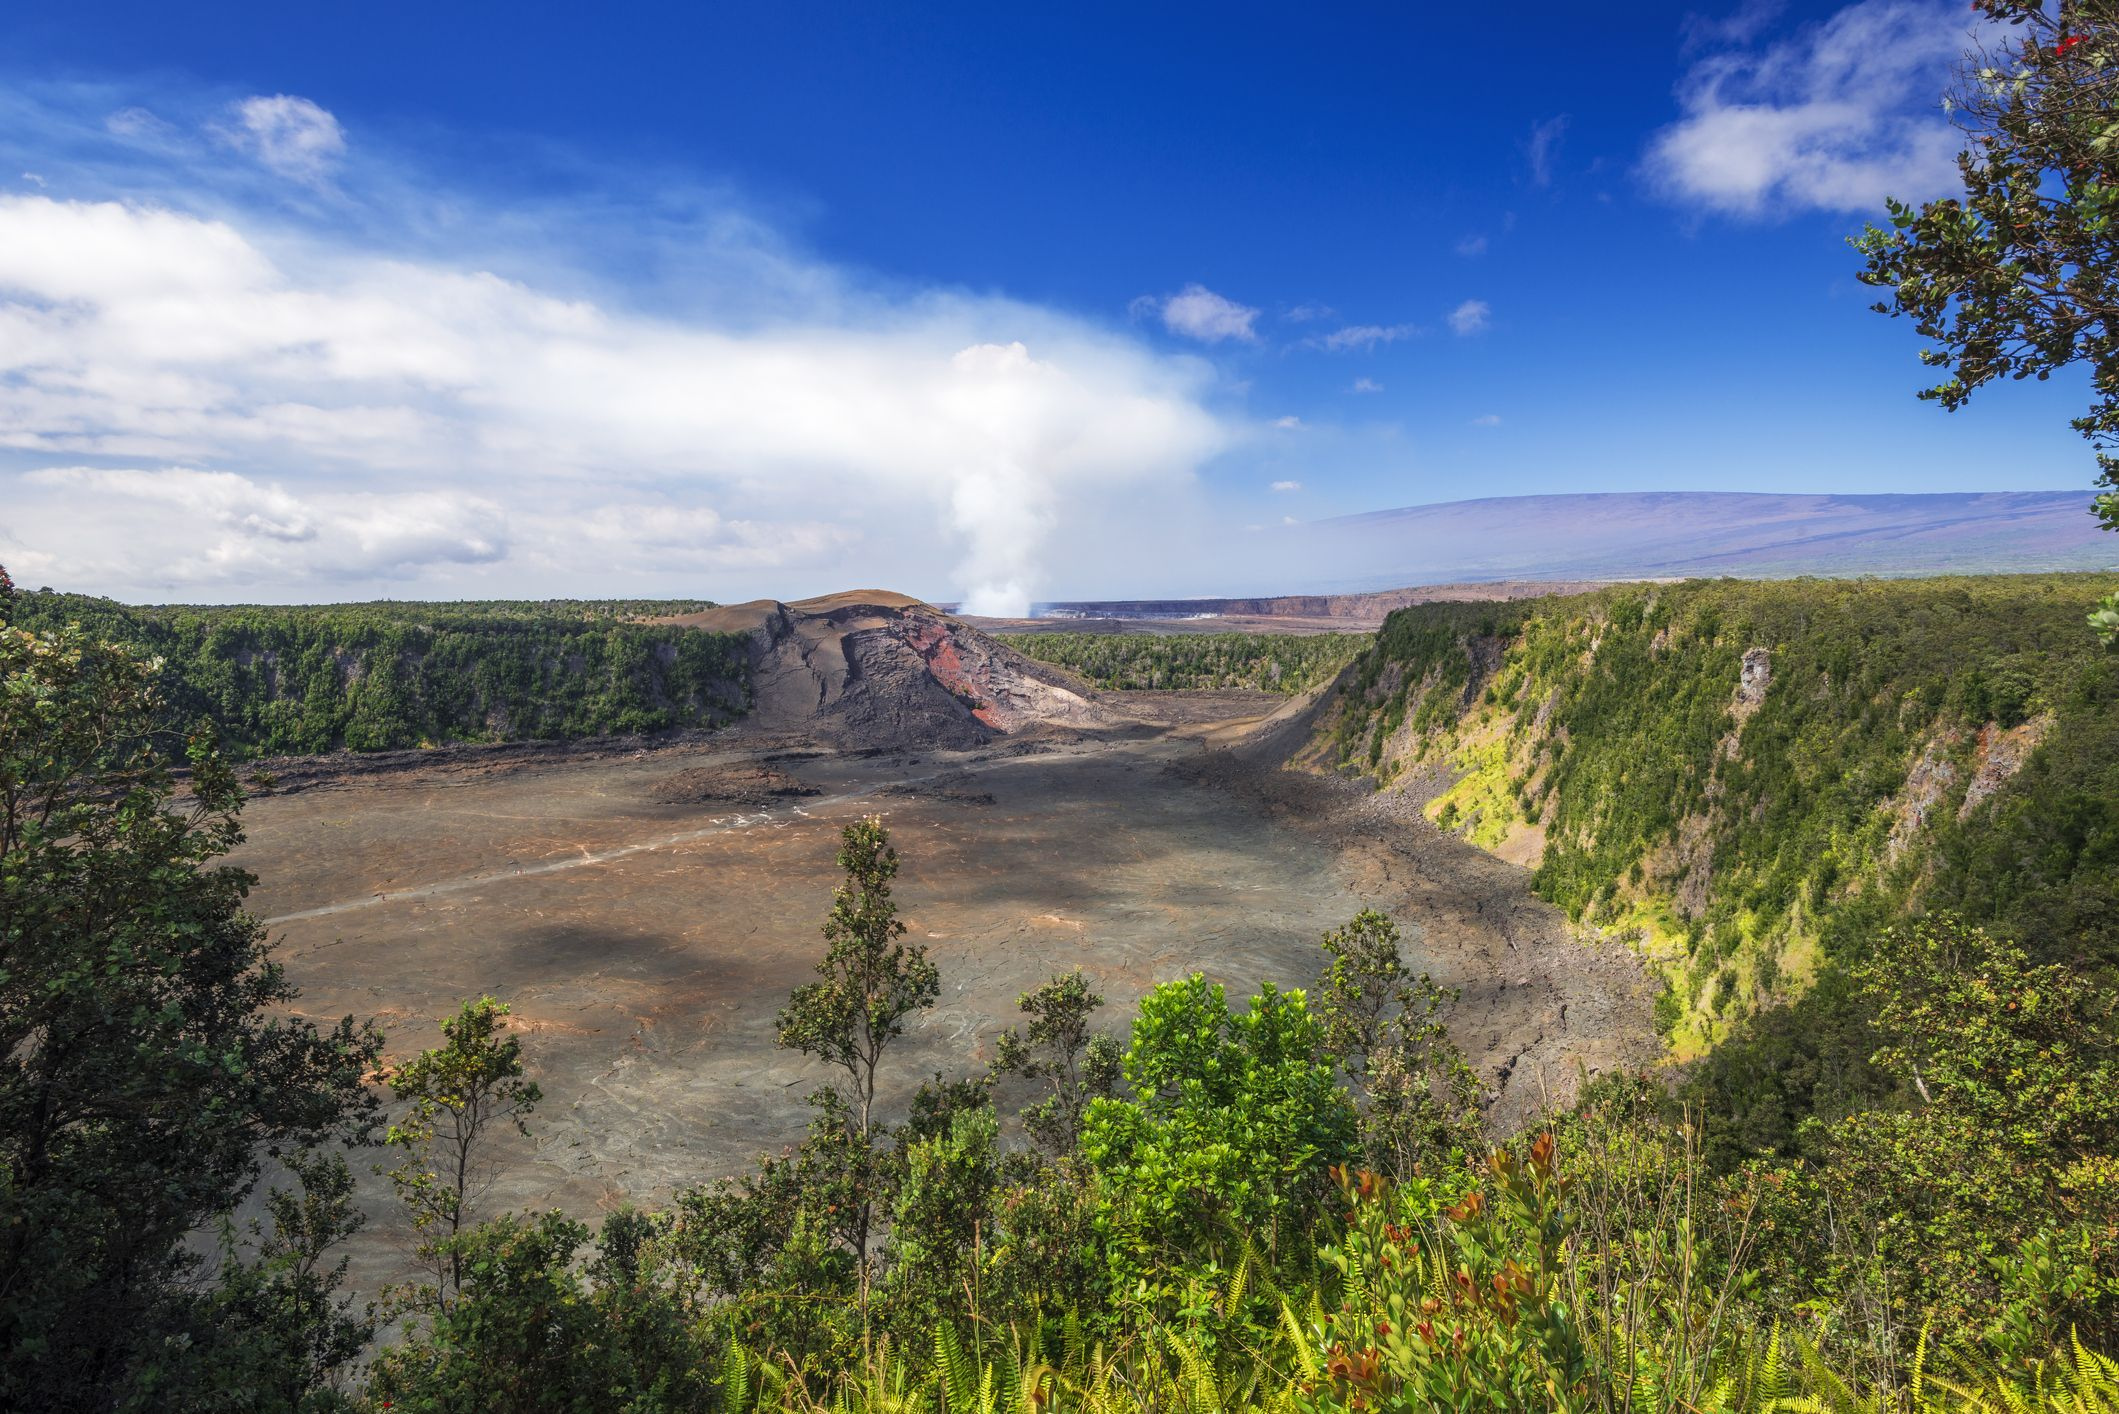 Landscape with Kilauea Iki and steam from Halemaumau Crater, Hawaii Volcanoes National Park, Hawaii, USA